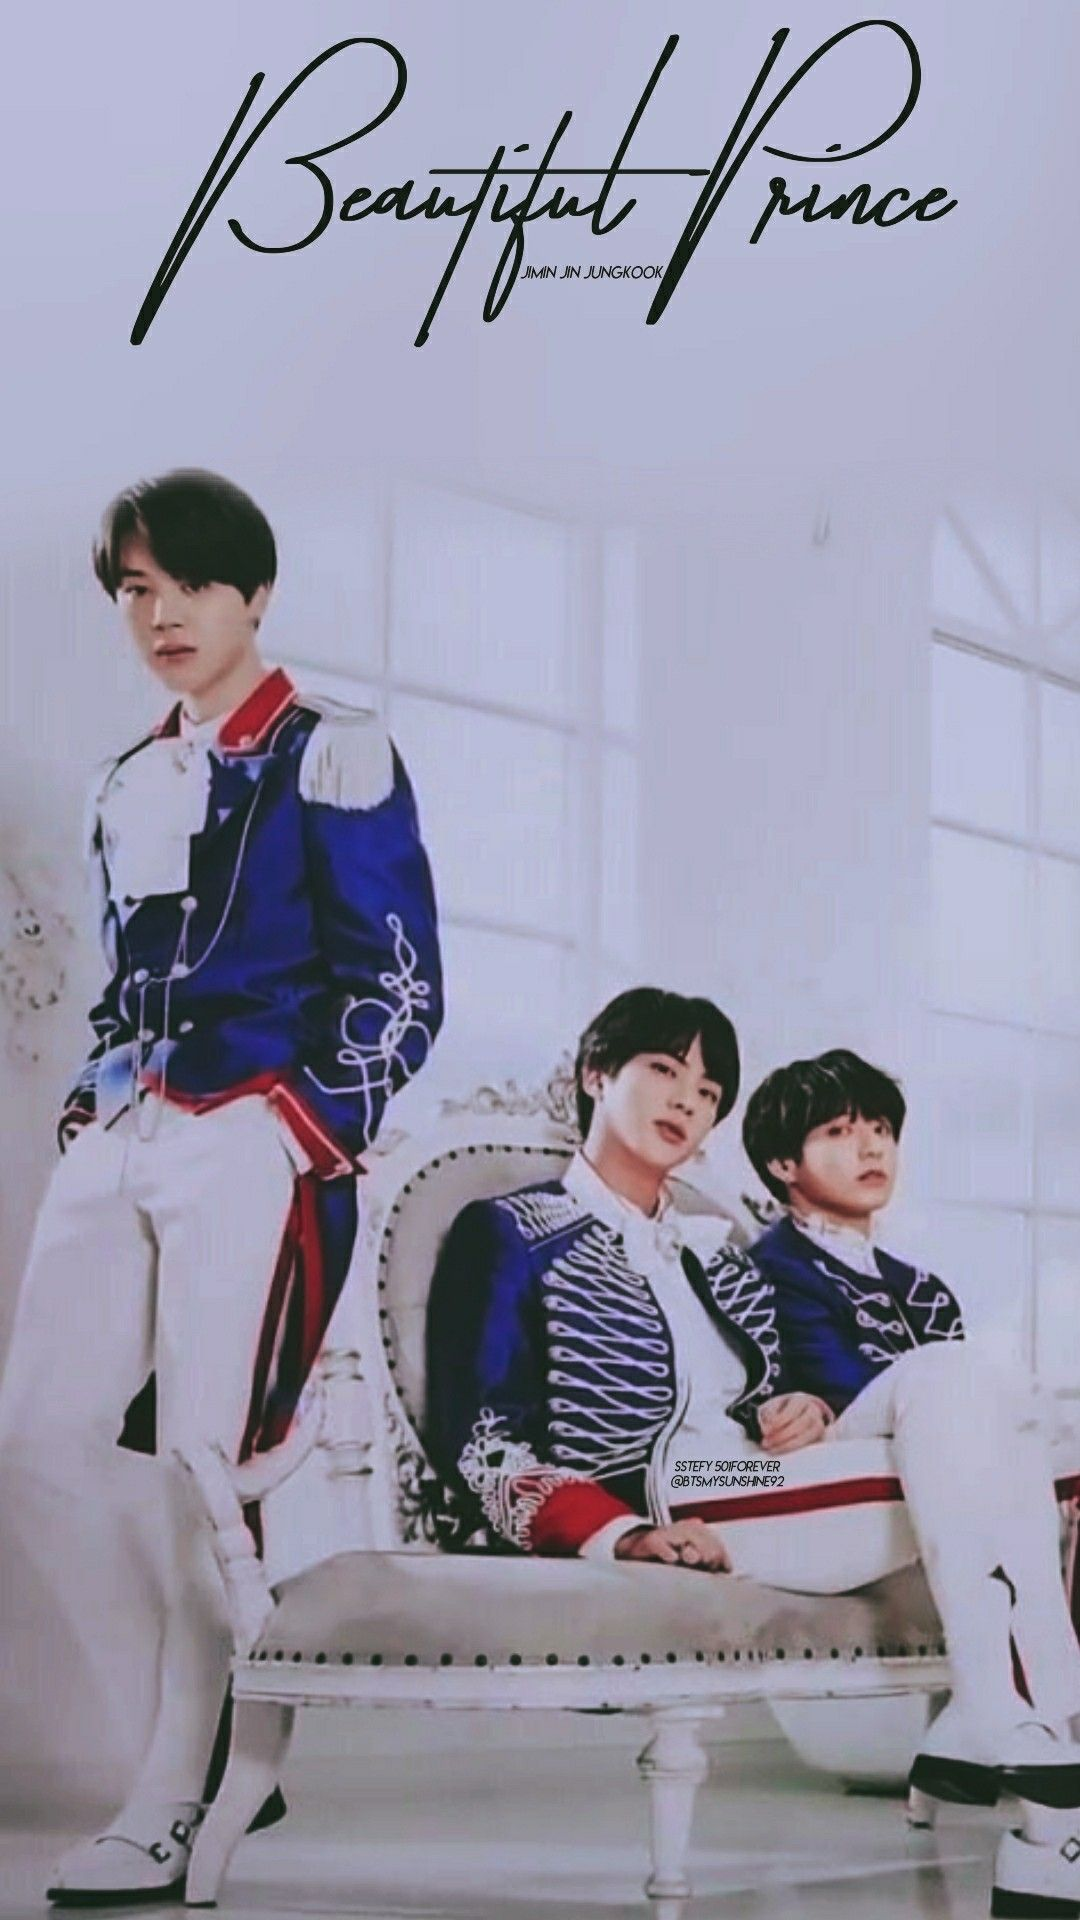 Jimin Jin Jungkook Fancafe Lockscreen Wallpapers - Year of